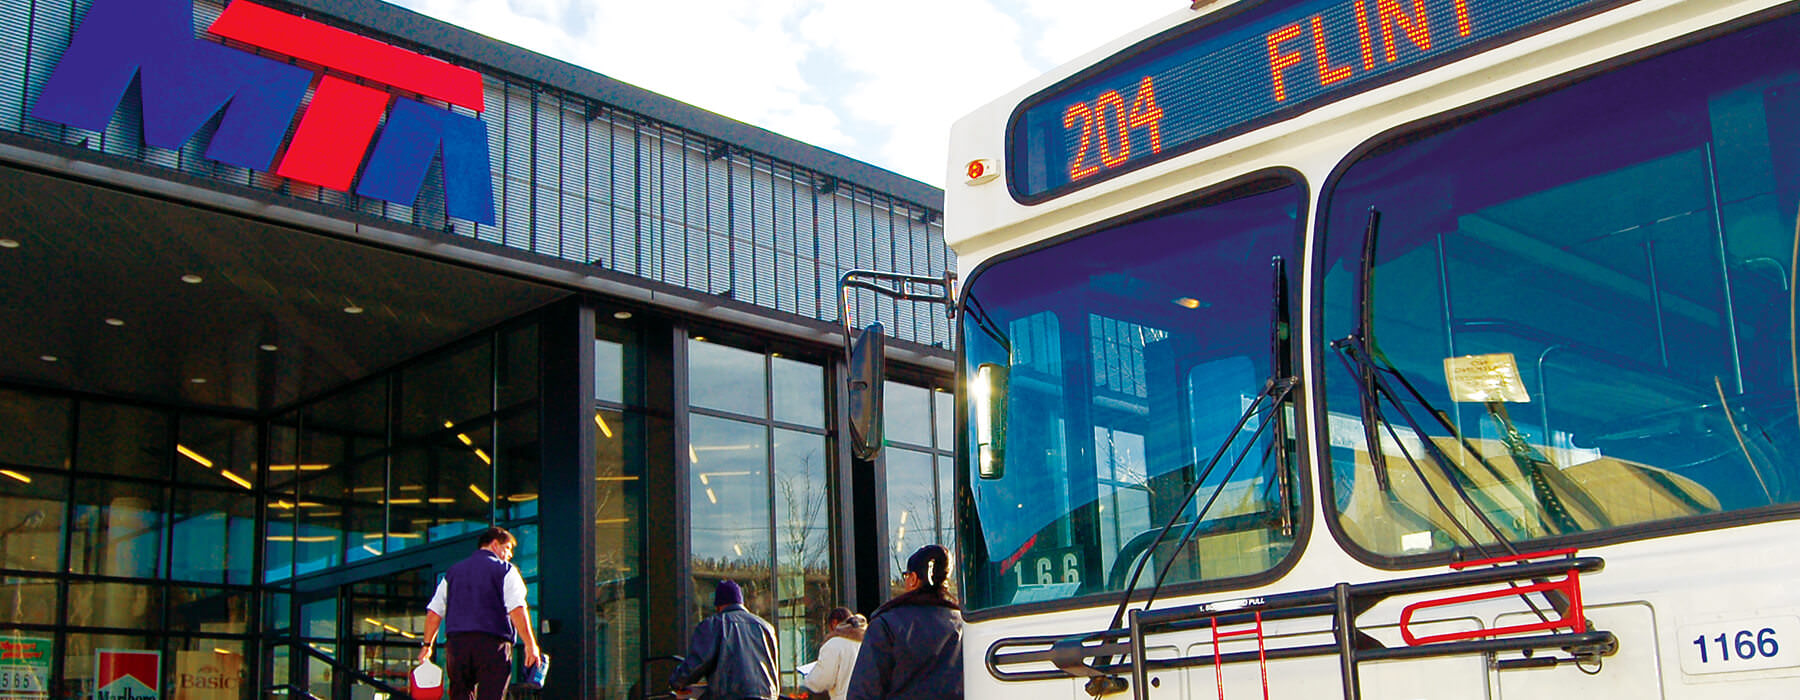 A bus waiting outside a MTA terminal.